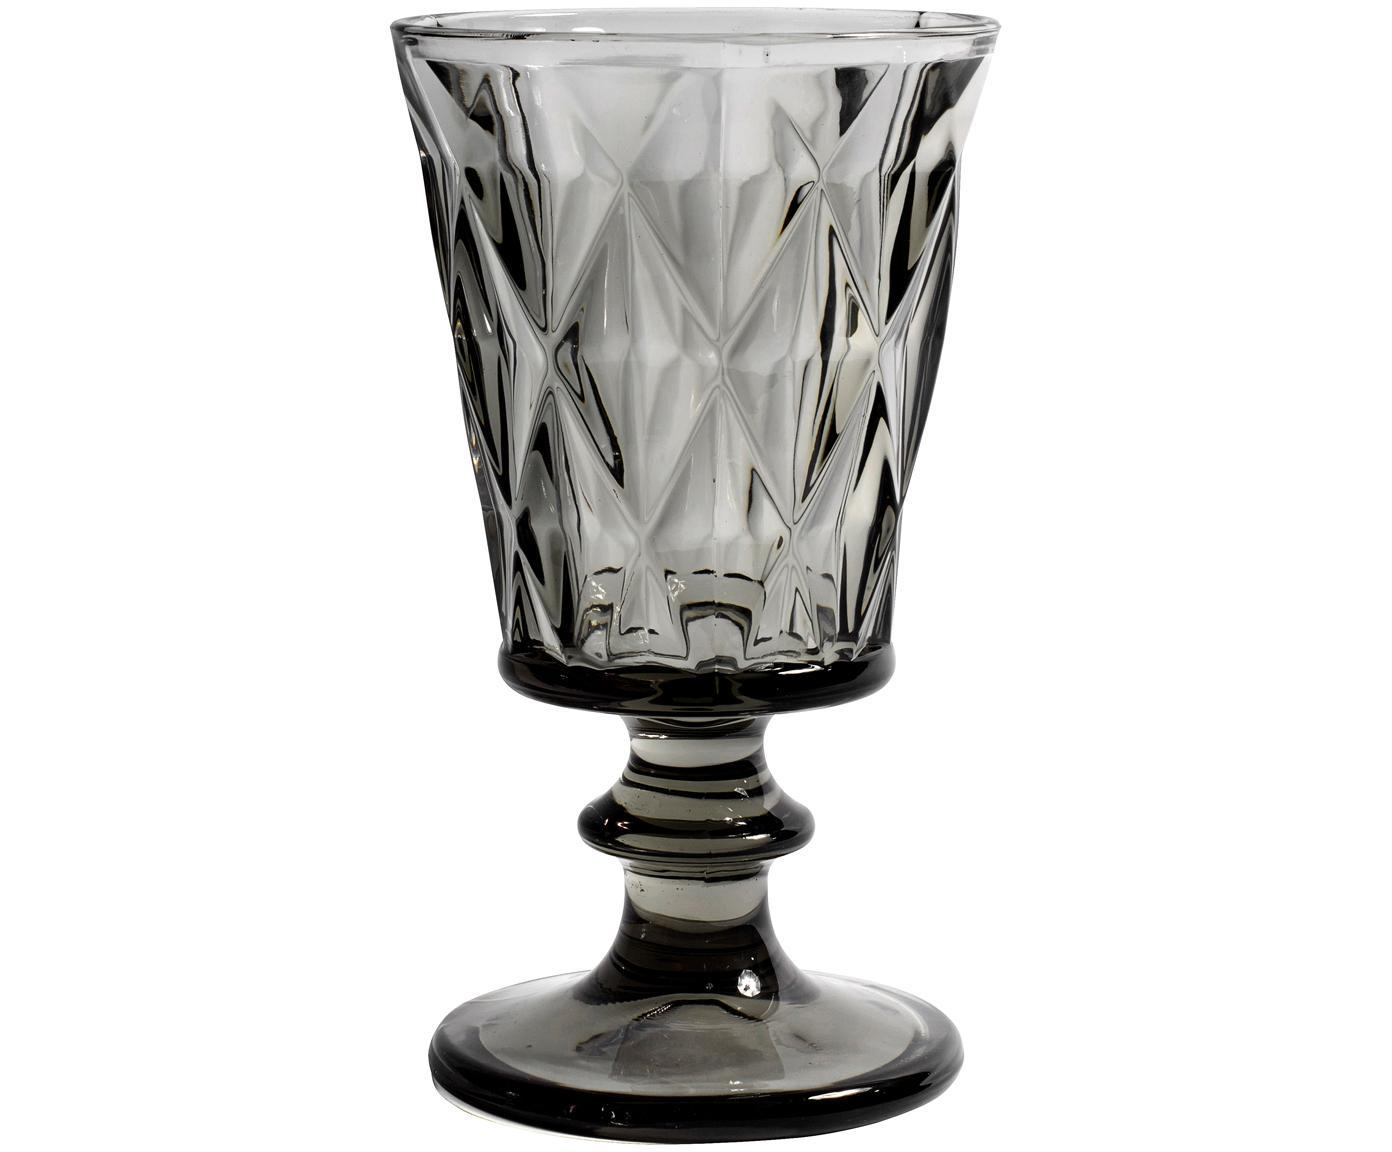 Kieliszek do wina Diamond, 6 szt., Szkło, Ciemnyszary, lekko transparentny, Ø 9 x W 16 cm